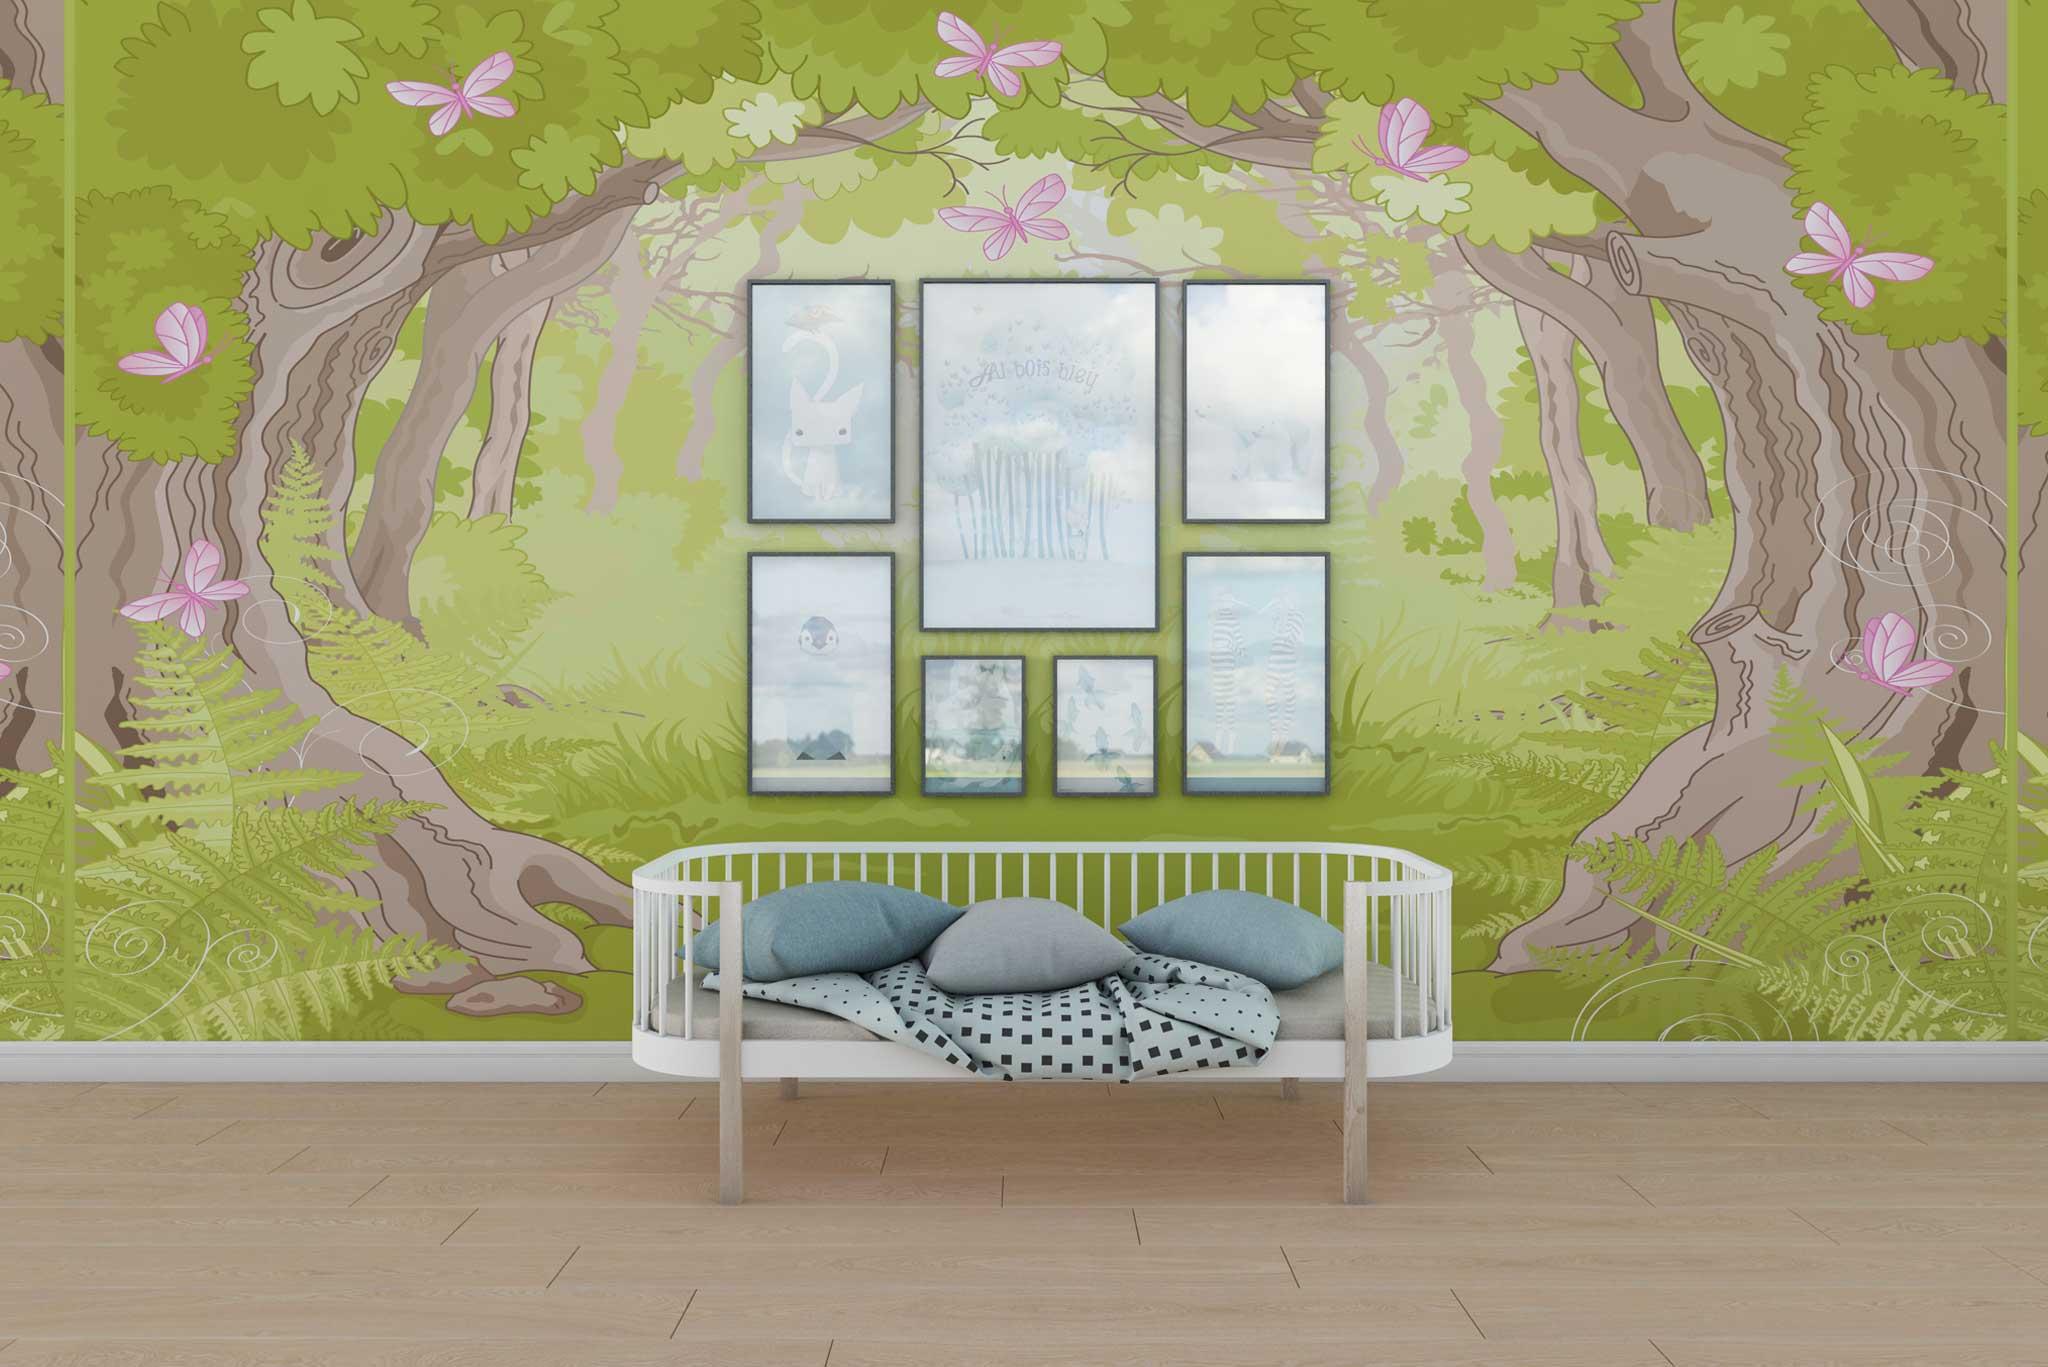 https://daringprints.ro/wp-content/uploads/2020/12/tapet-fototapet-design-personalizat-customizabil-comanda-special-camera-dormitor-copii-model-padurea-fermecata-poiana-fluturi-verde-roz.jpg